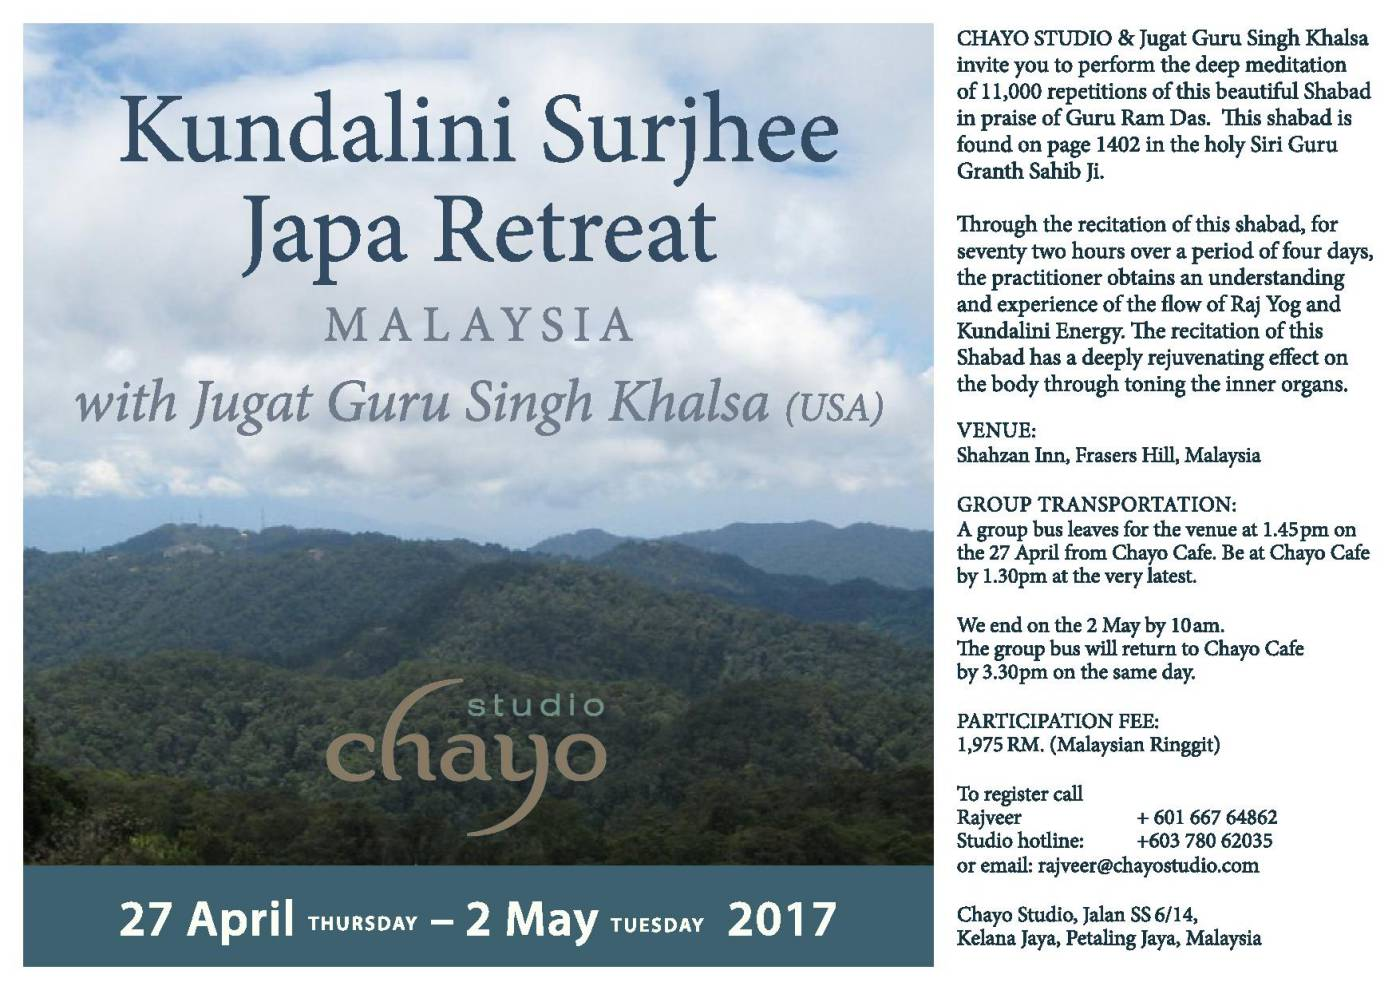 KS-japa-retreat-2017-brochure